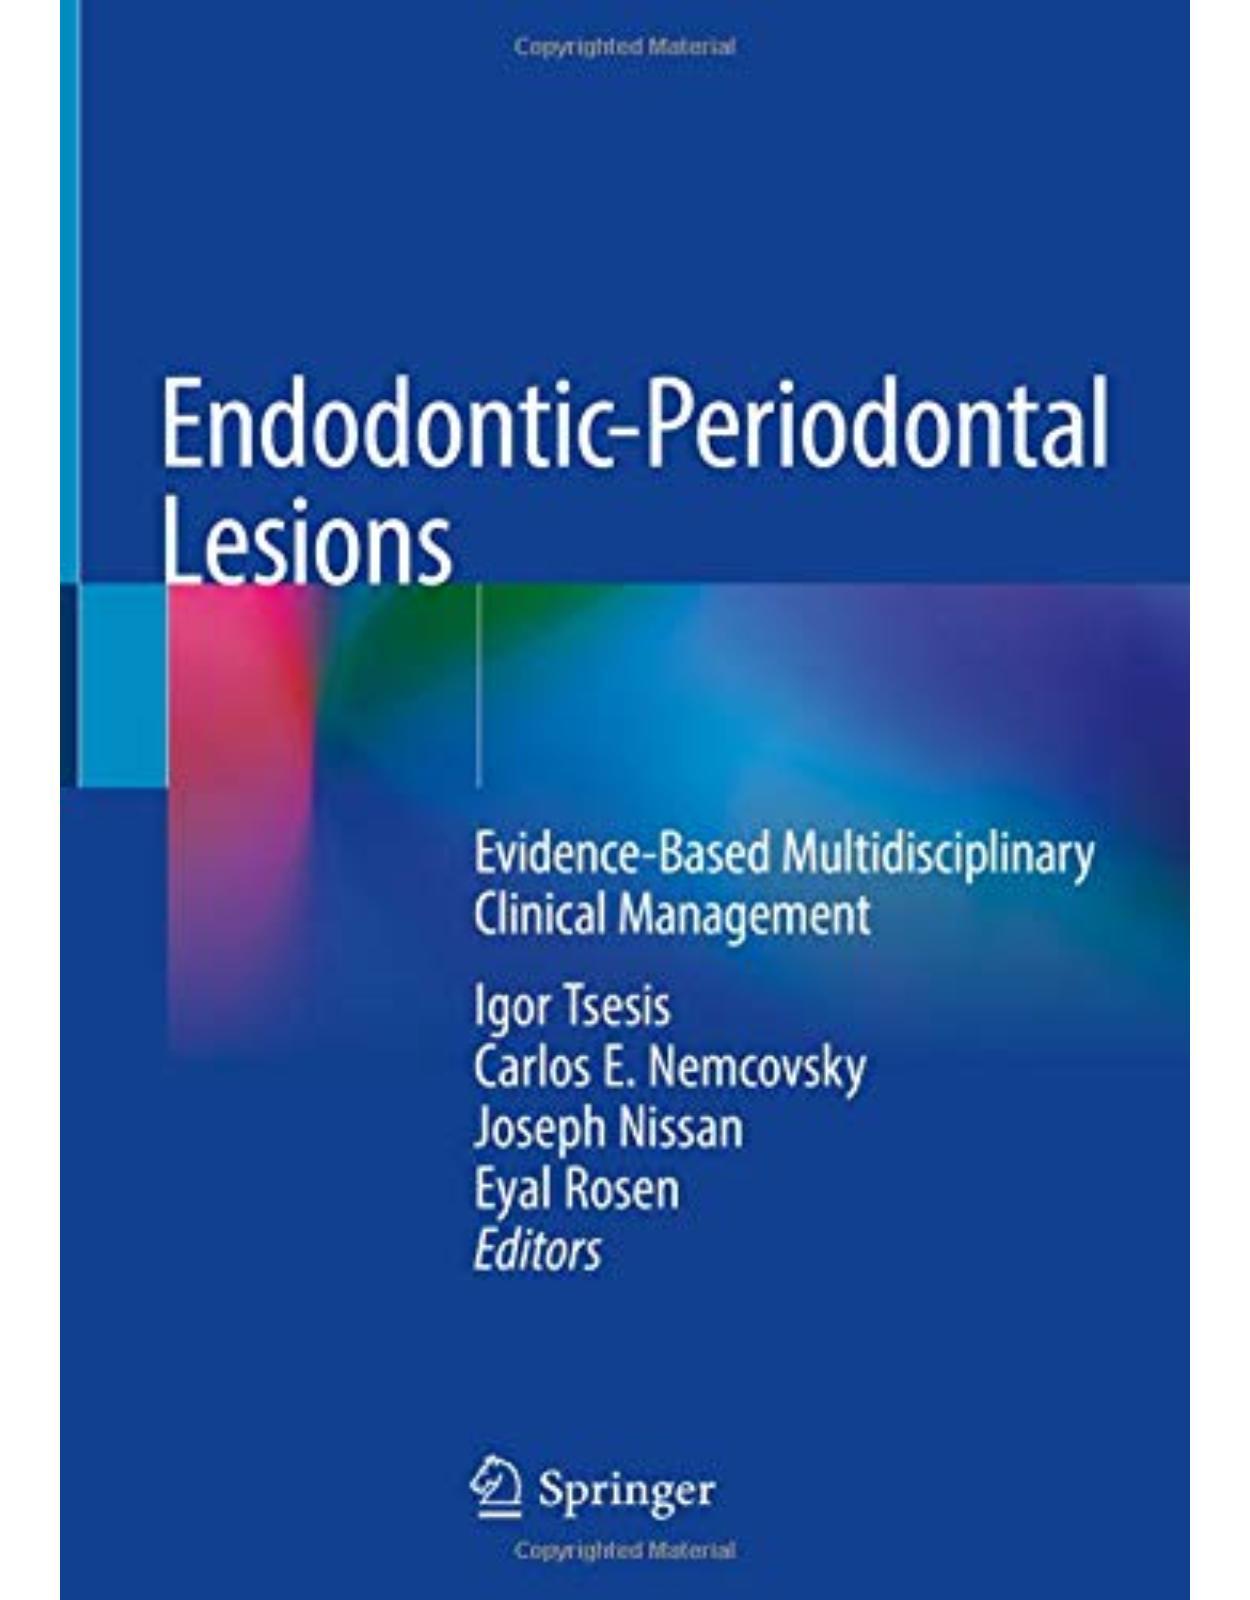 Endodontic-Periodontal Lesions